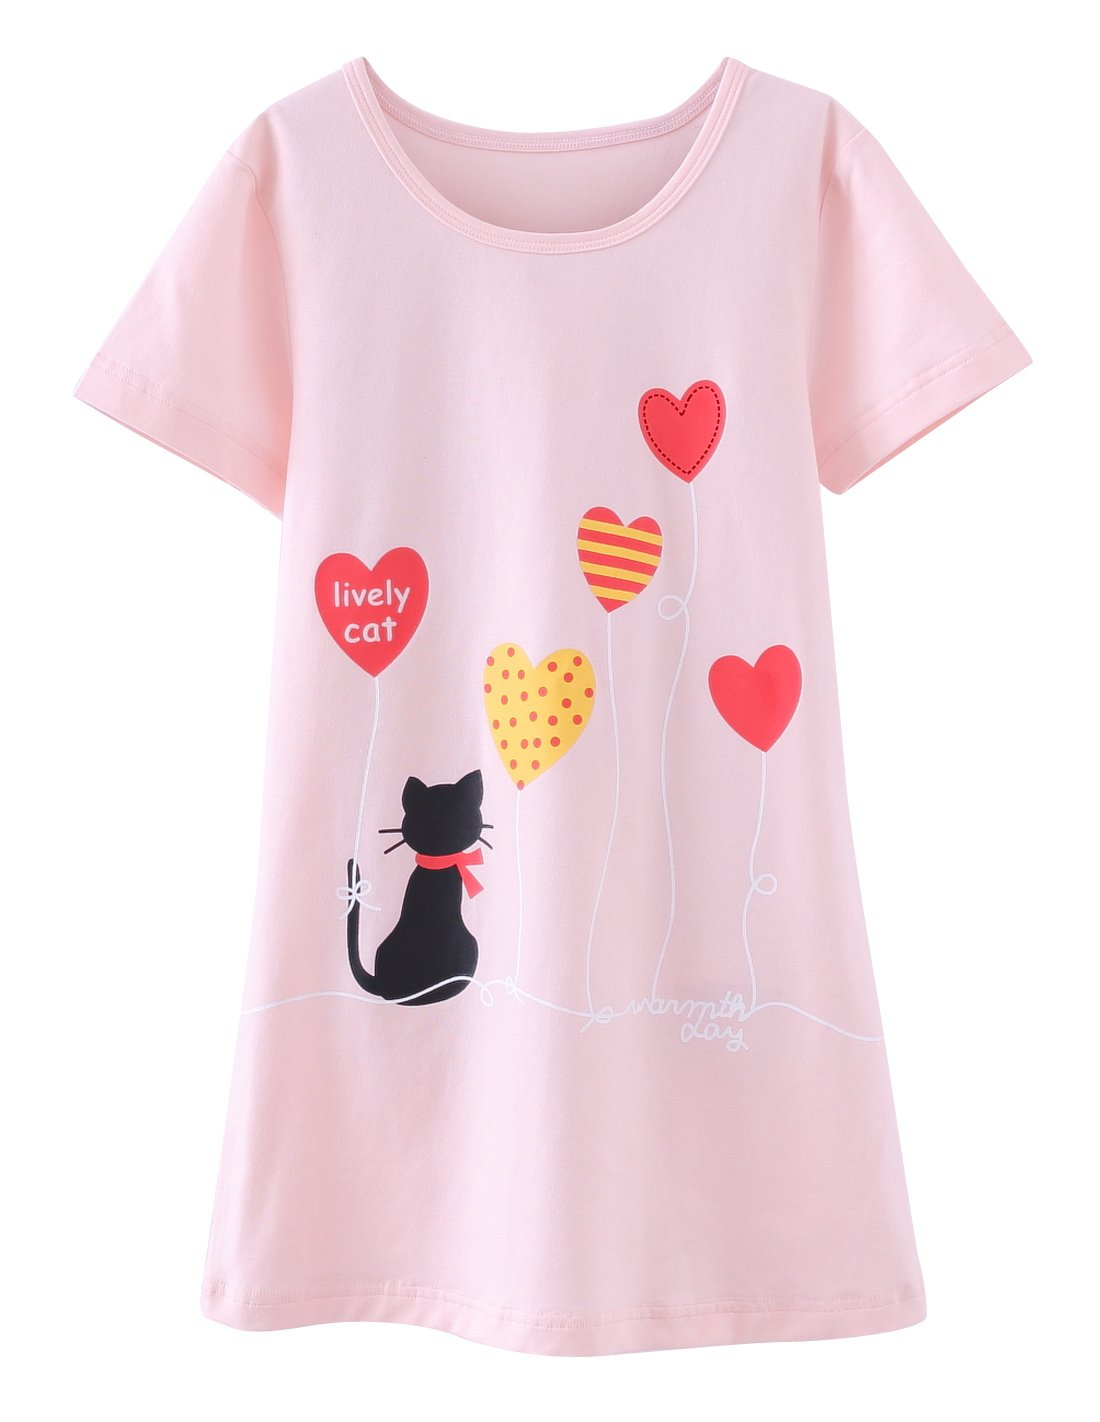 Girls Summer Nightgown Short Sleeve Sleep Dresses Candy Children Pajamas for Toddler